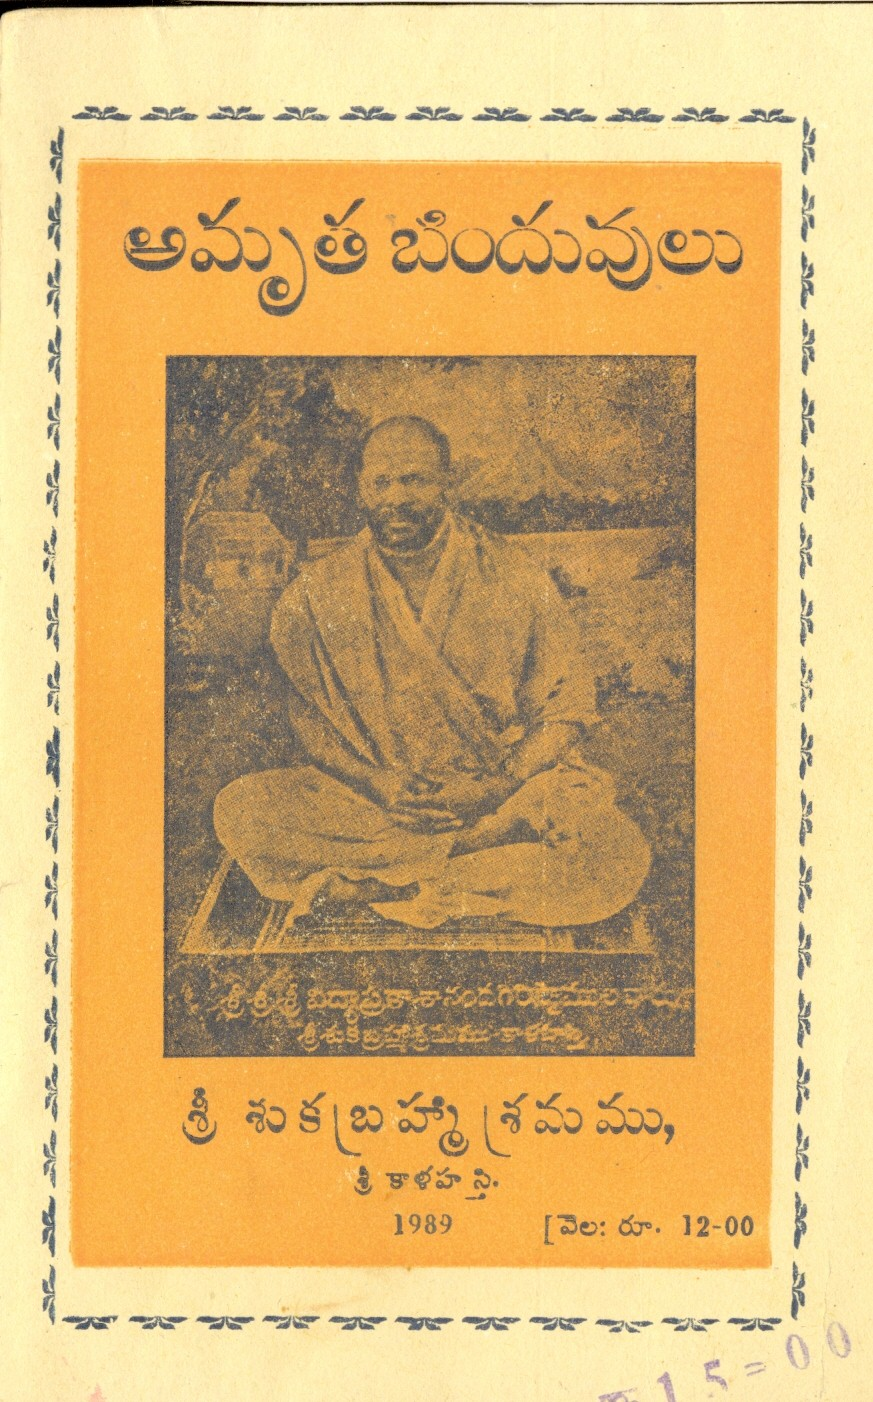 Read bhagavata purana online dating 2